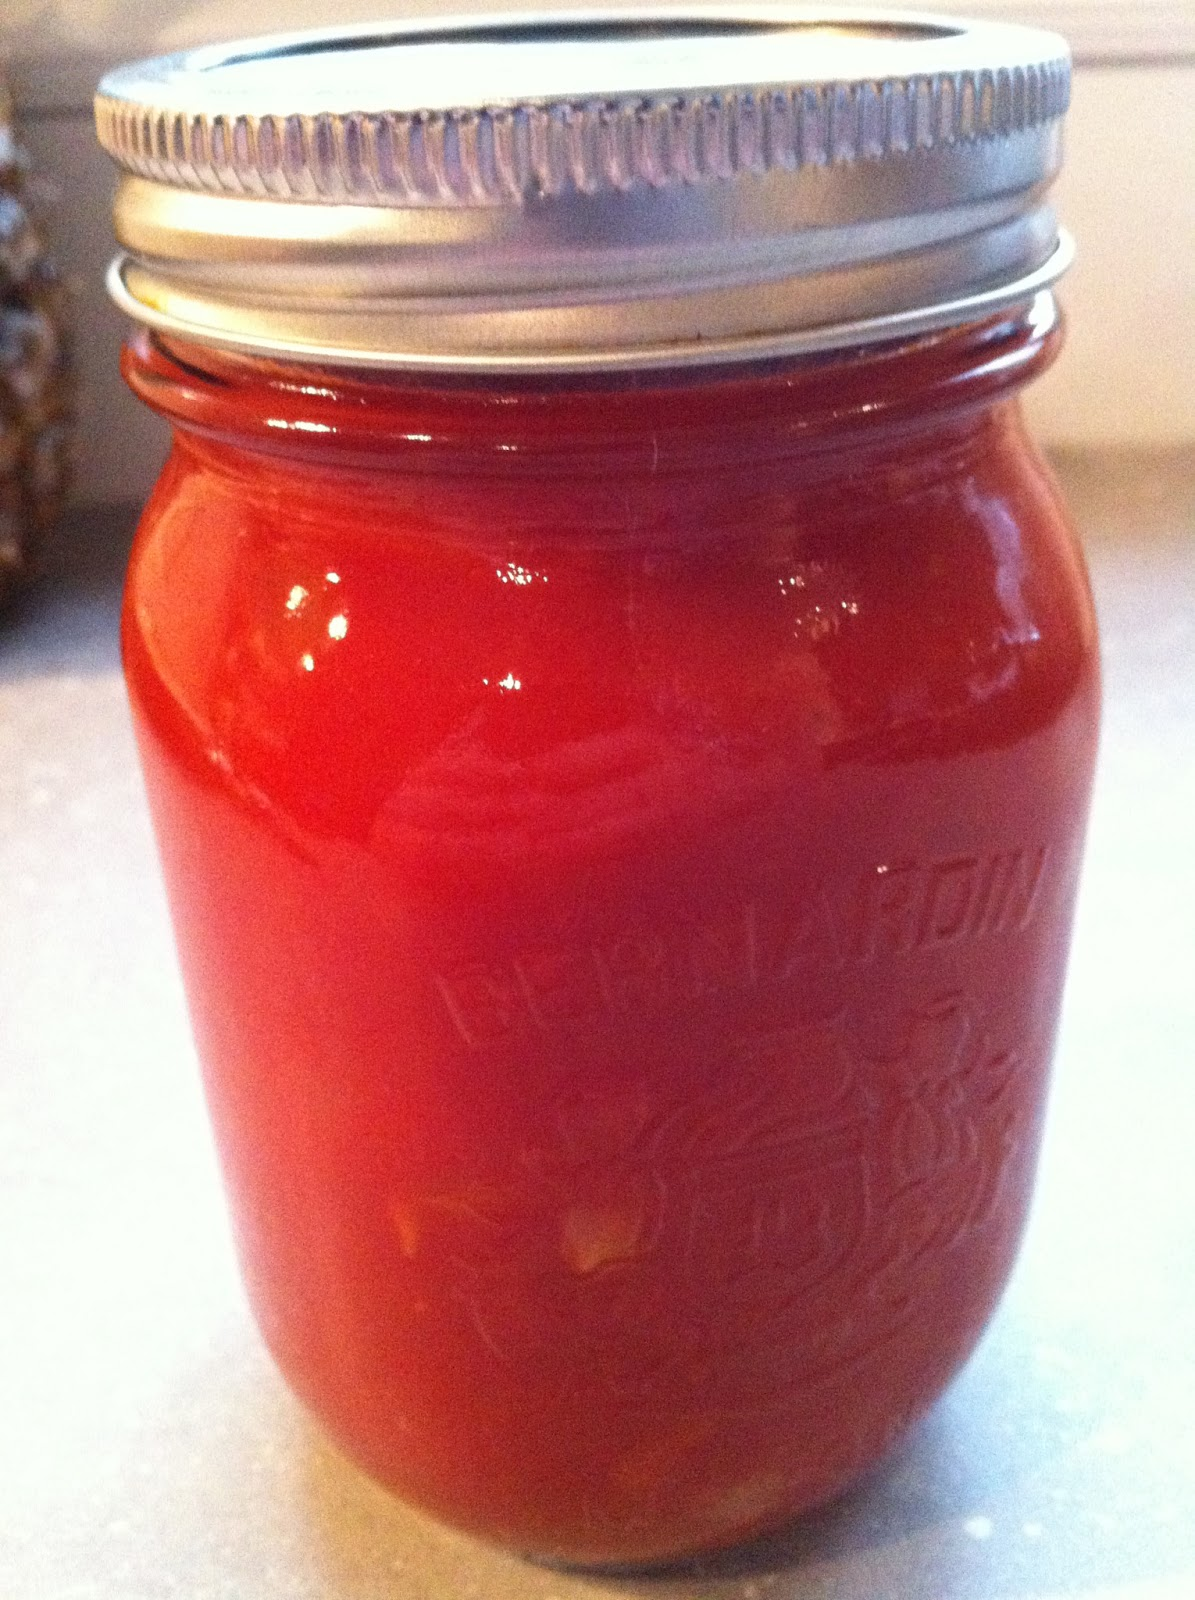 Porc gal sauce tomate la fa on de pasquale vari - Enlever tache sauce tomate ...